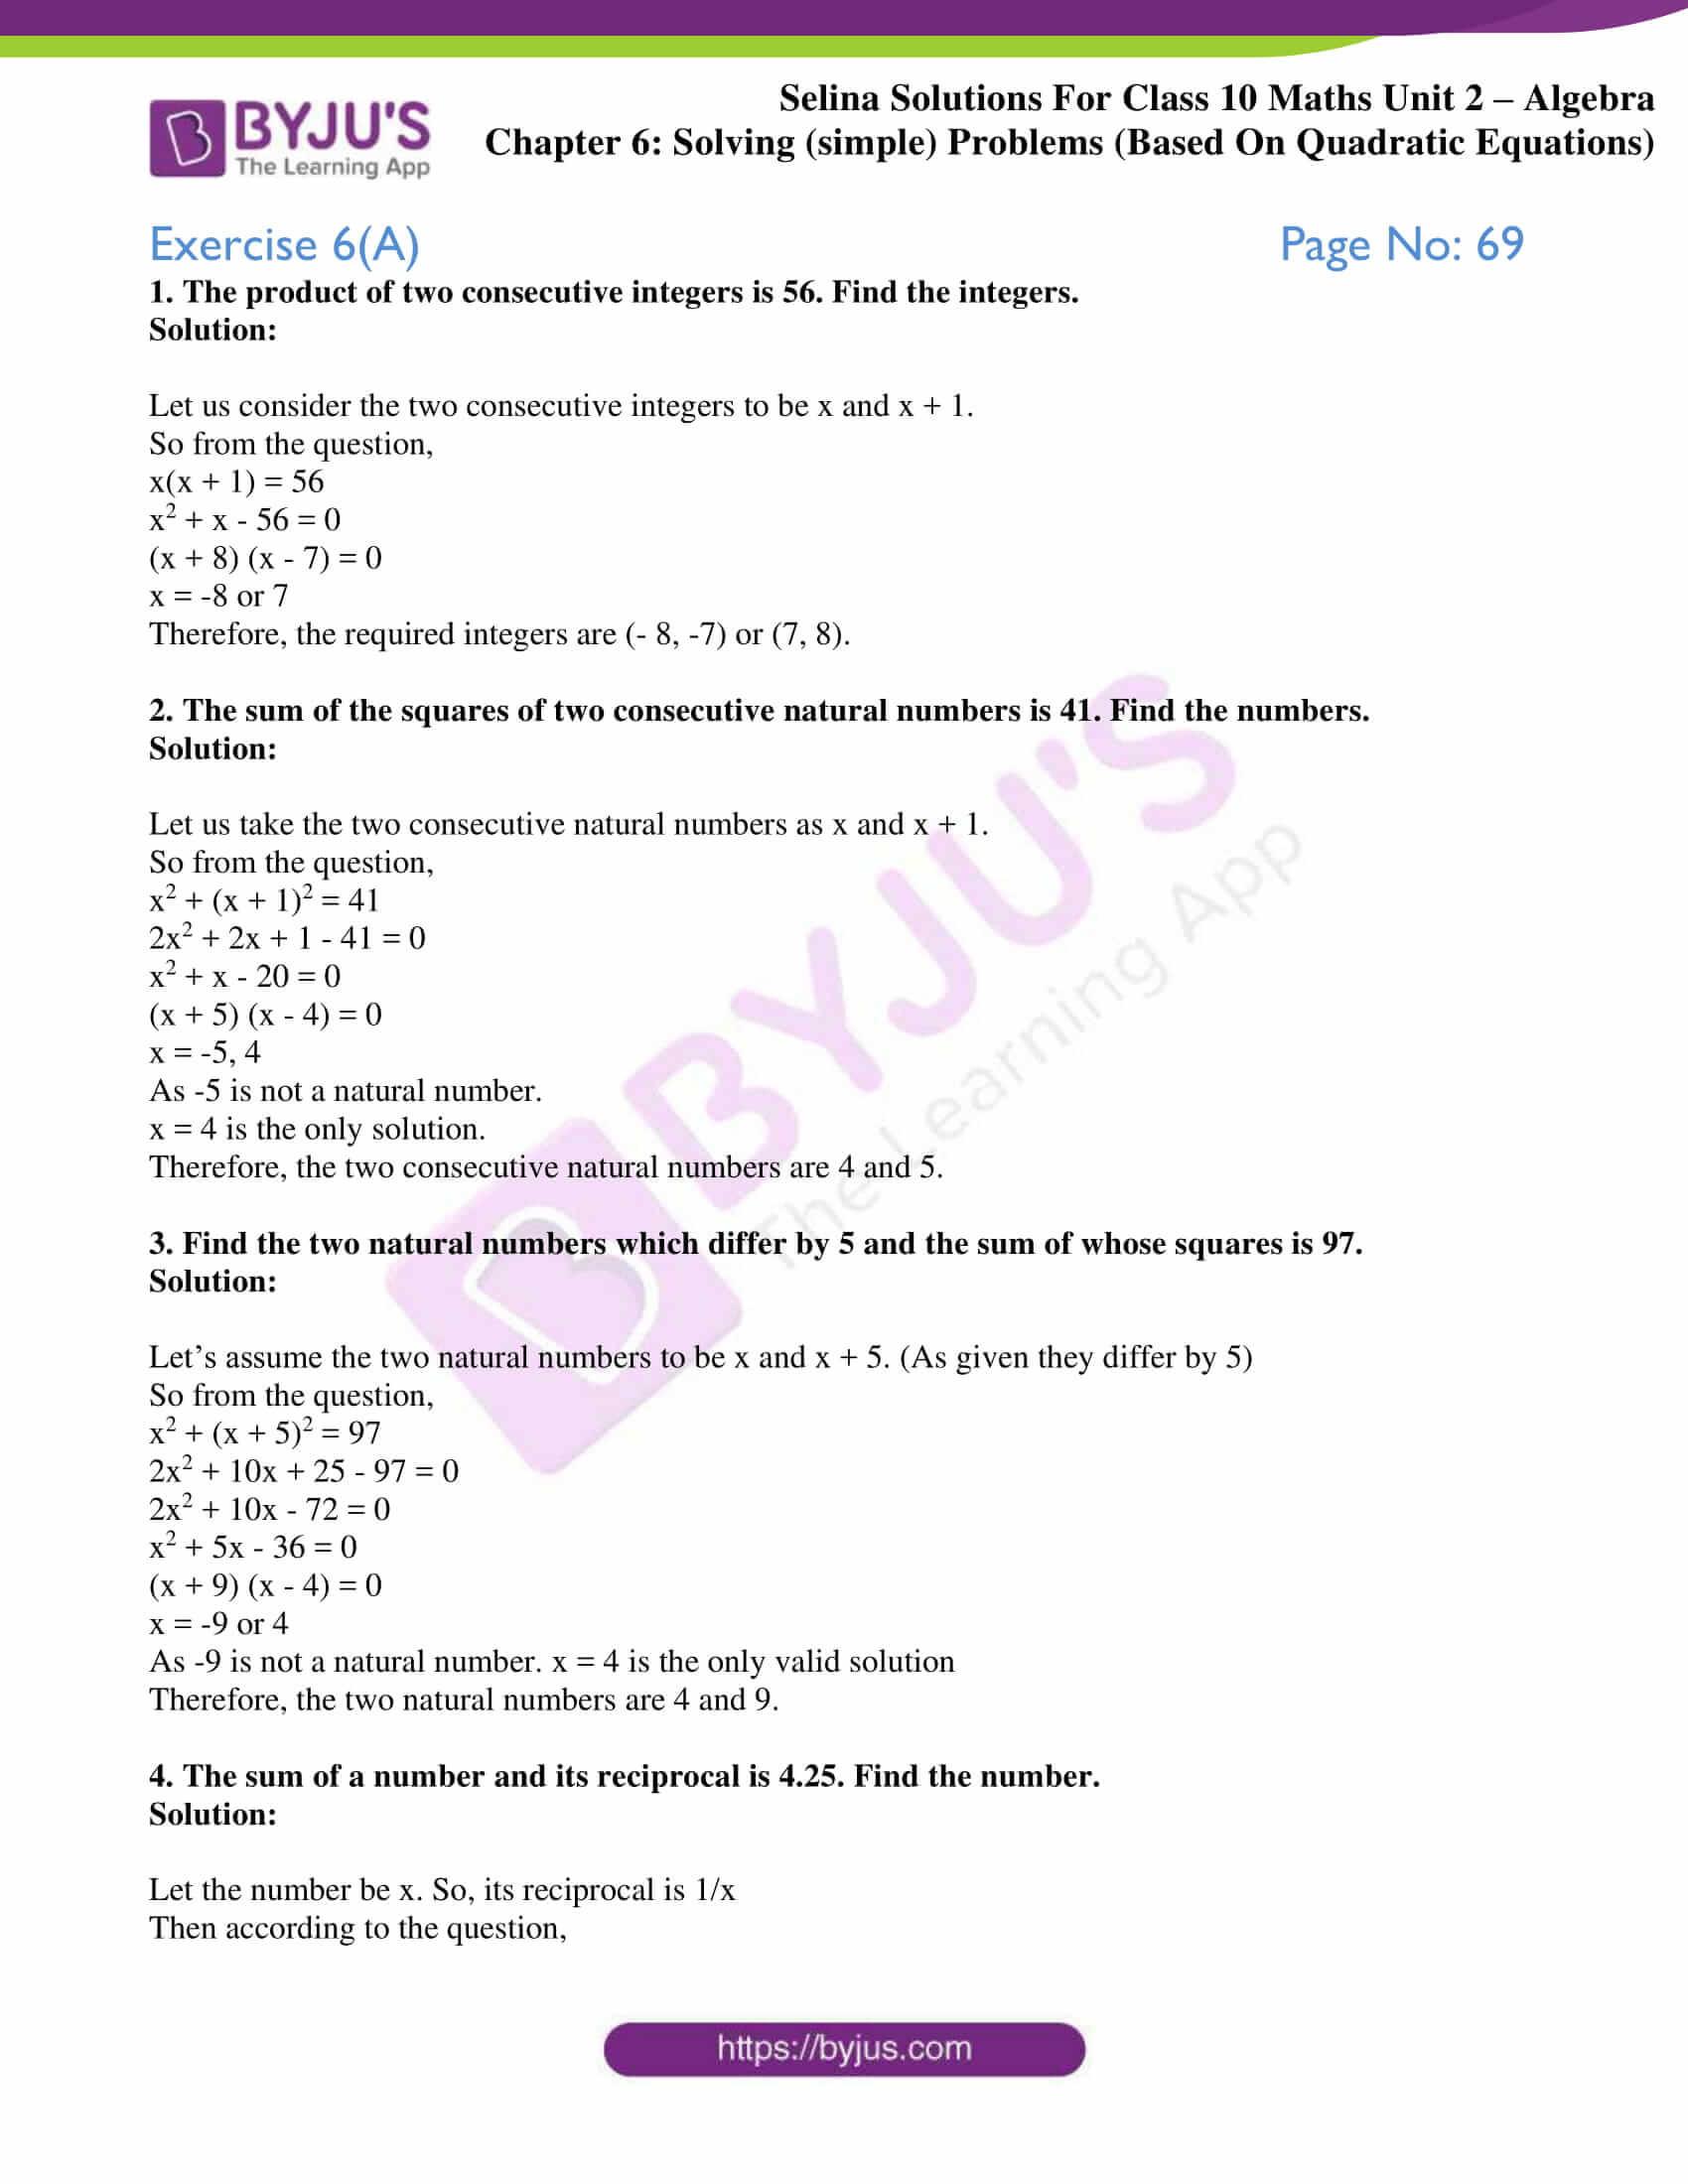 Quadratic Equations Word Problems Worksheet Education